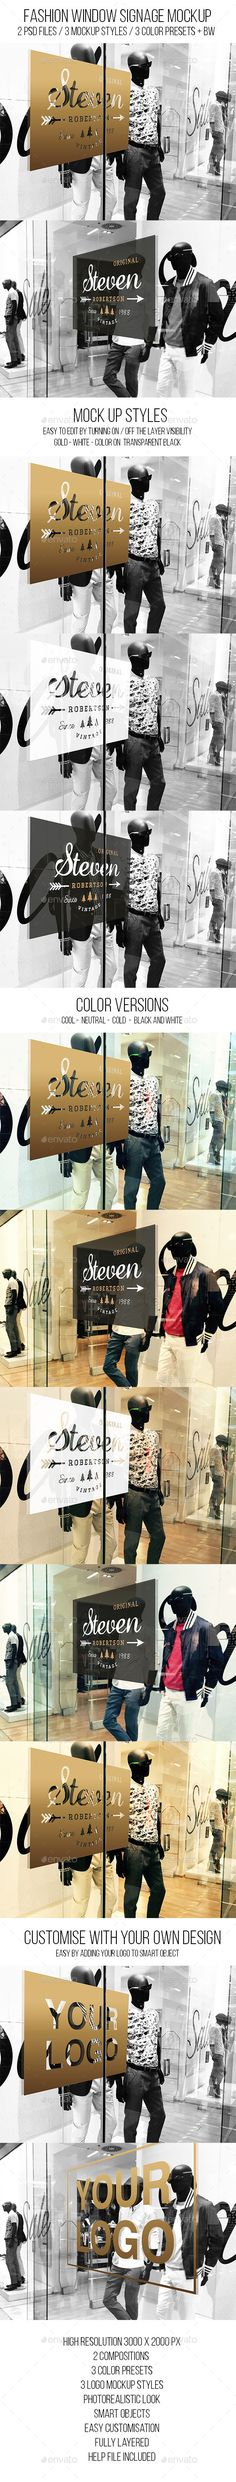 Fashion Window Signage Mockup #design Download: http://graphicriver.net/item/fashion-window-signage-mockup/12122510?ref=ksioks